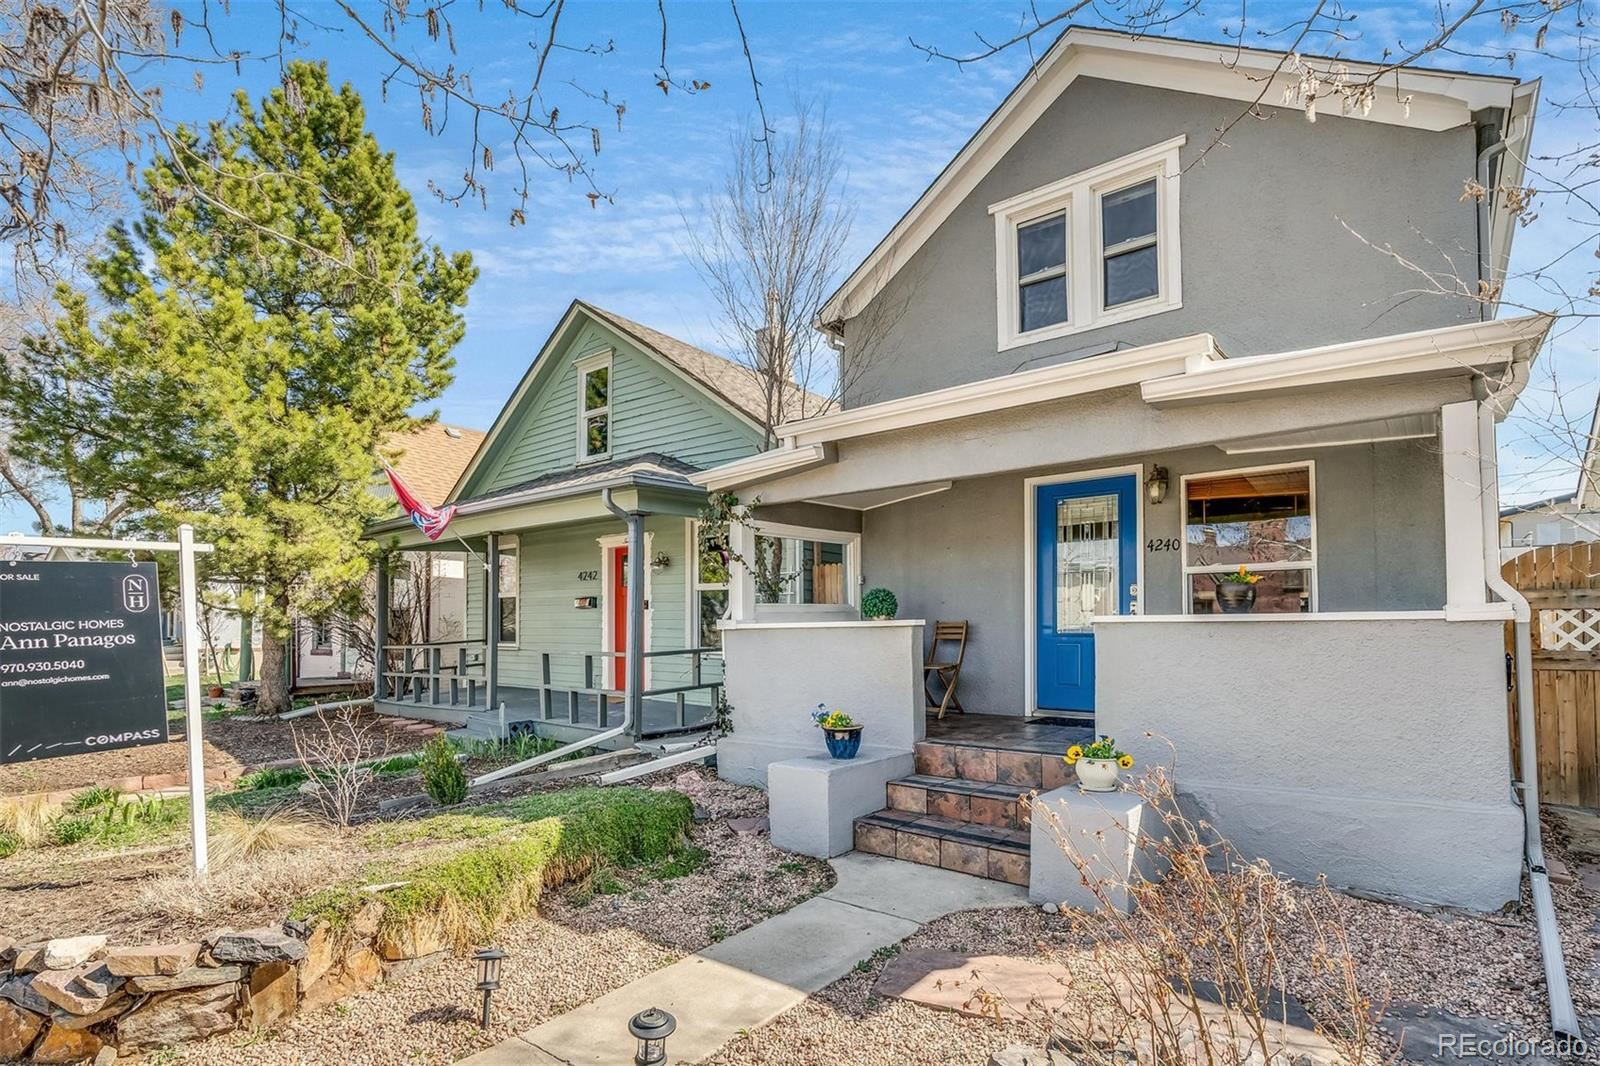 Photo of 4240 Quitman Street, Denver, CO 80212 (MLS # 6637742)